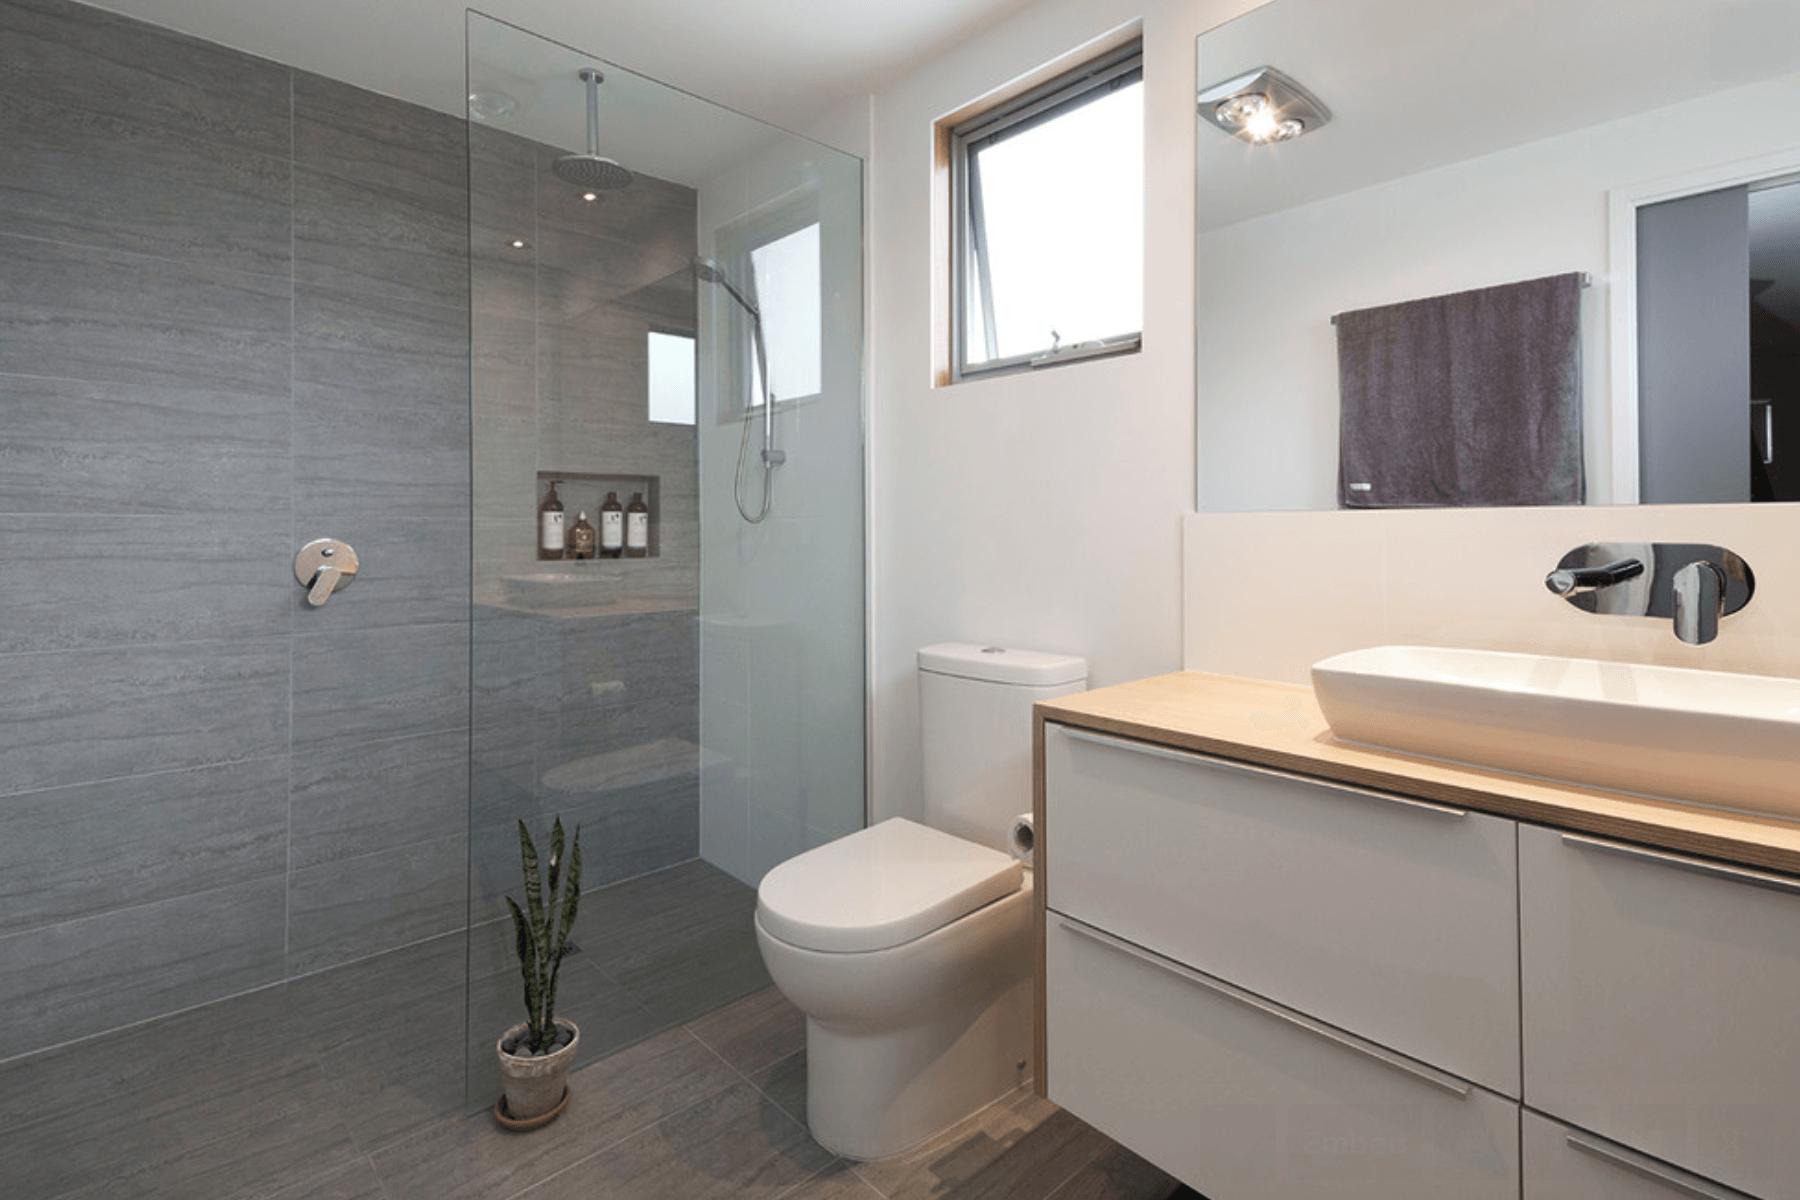 Banheiro Banheiro Moderno #7D634E 1800x1200 Banheiro Bonito E Pequeno